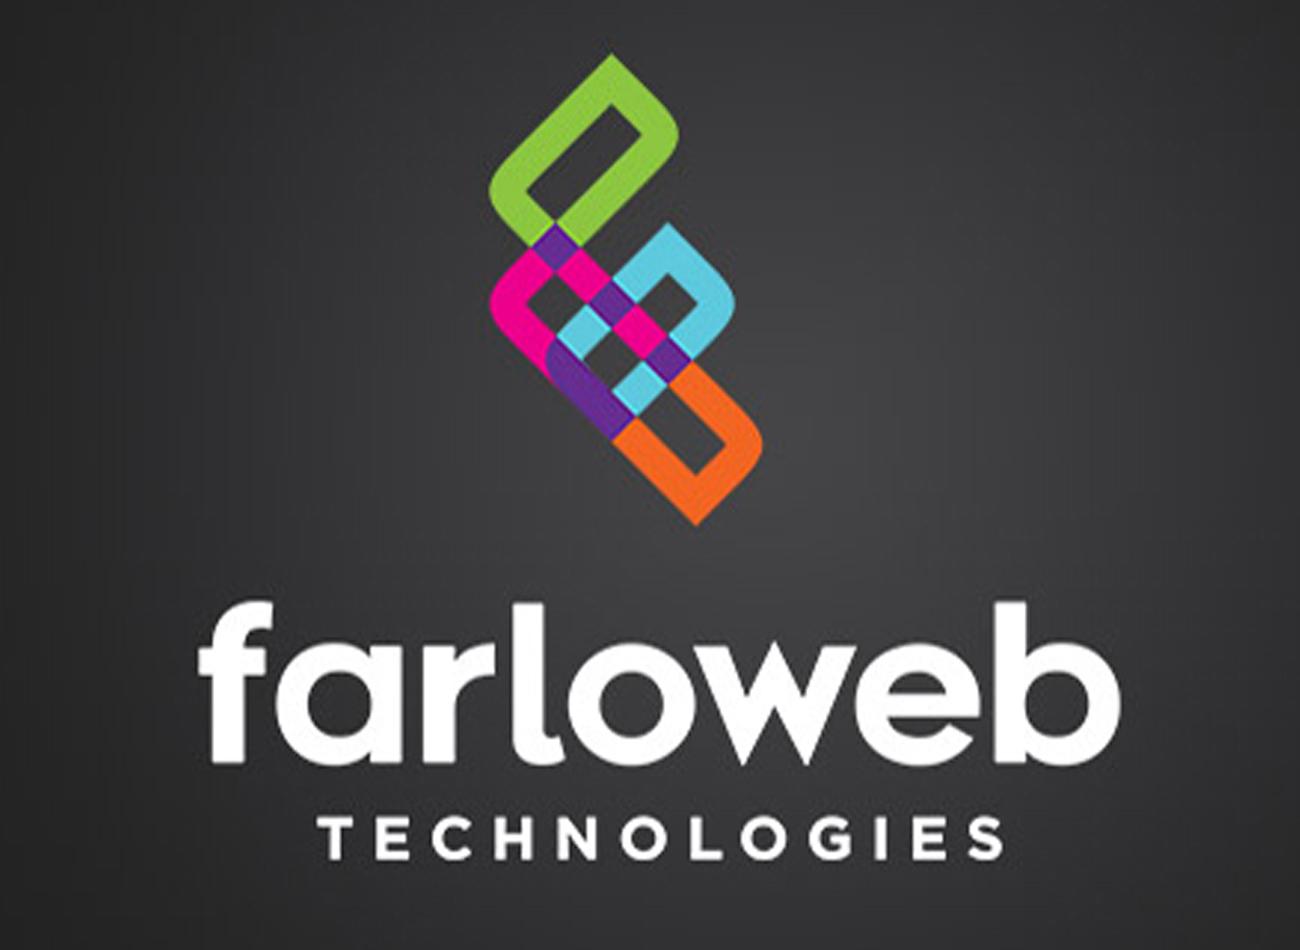 farloweb-Logo-Case-Study-Corporate-Identity-Agent-Orange-Design-Thumbnail.jpg